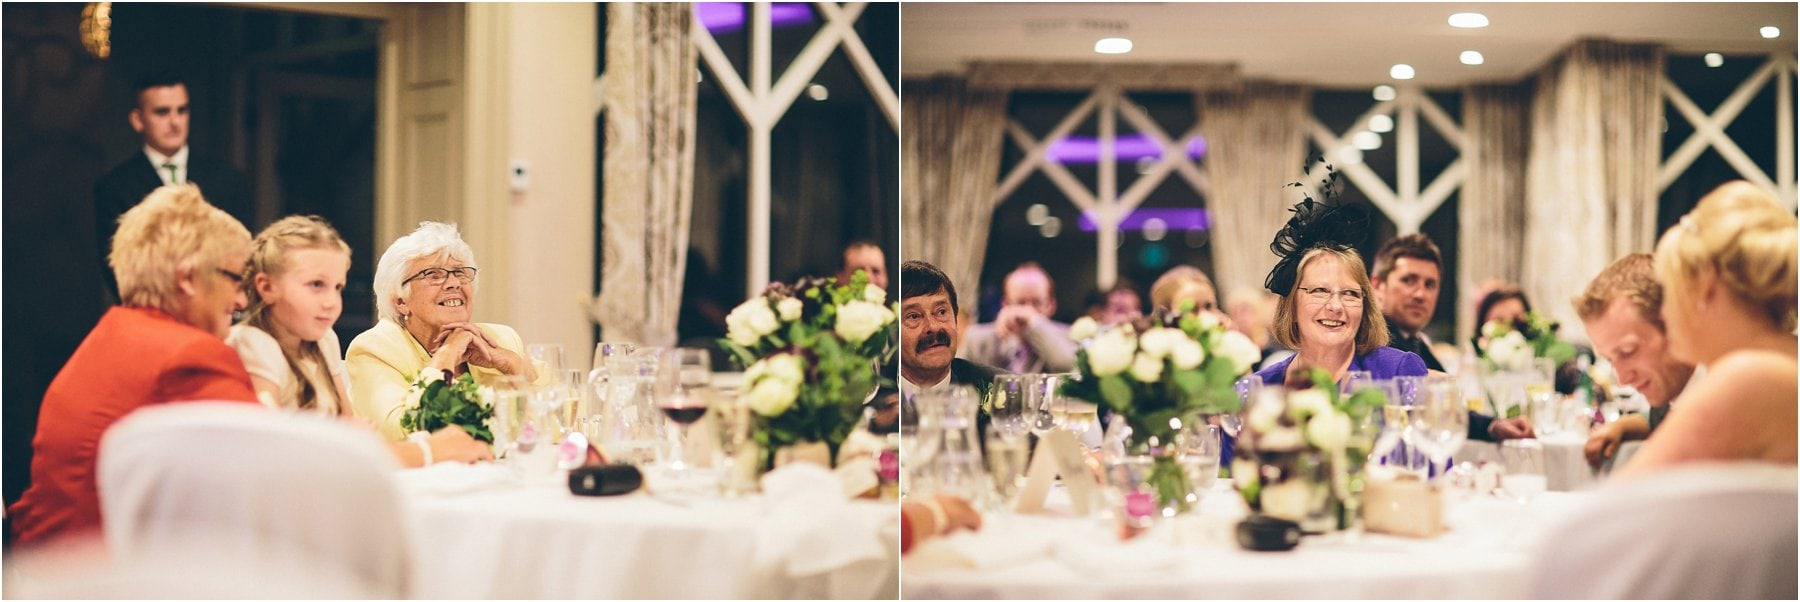 Crabwall_Manor_Wedding_Photography_0077